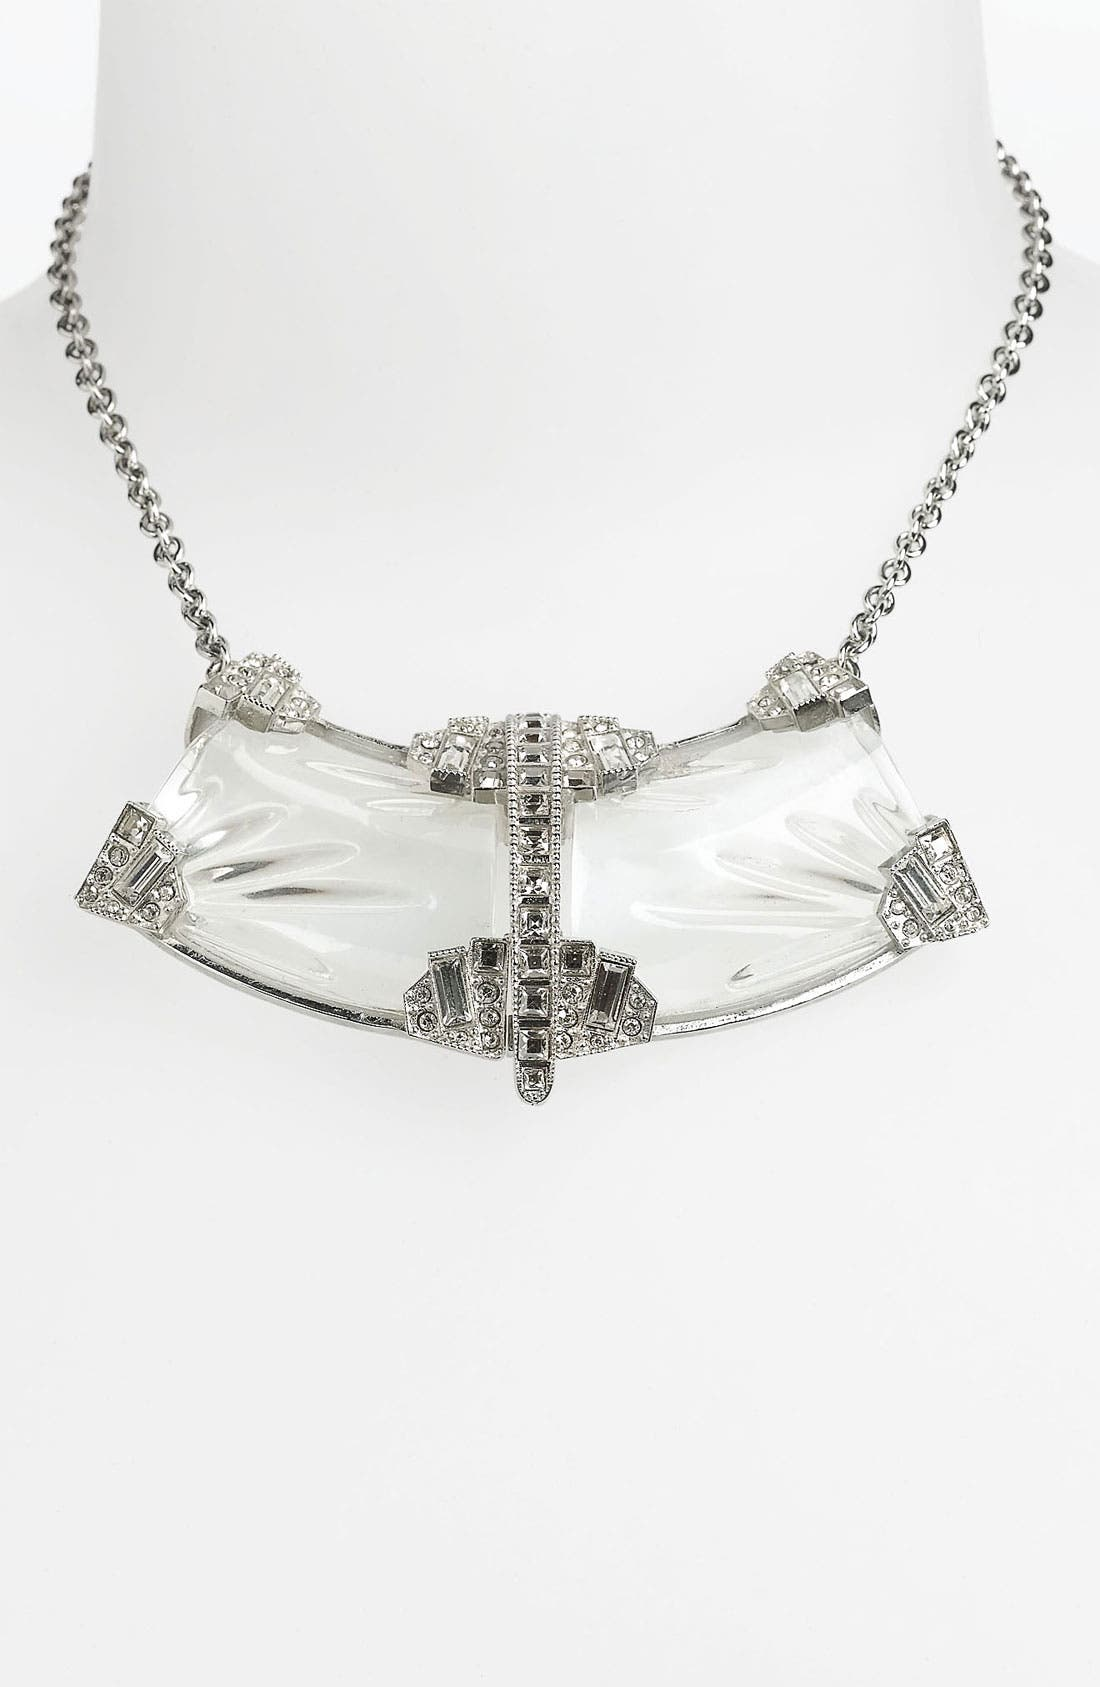 Alternate Image 1 Selected - Alexis Bittar 'Teatro Moderne' Bib Necklace (Nordstrom Exclusive)